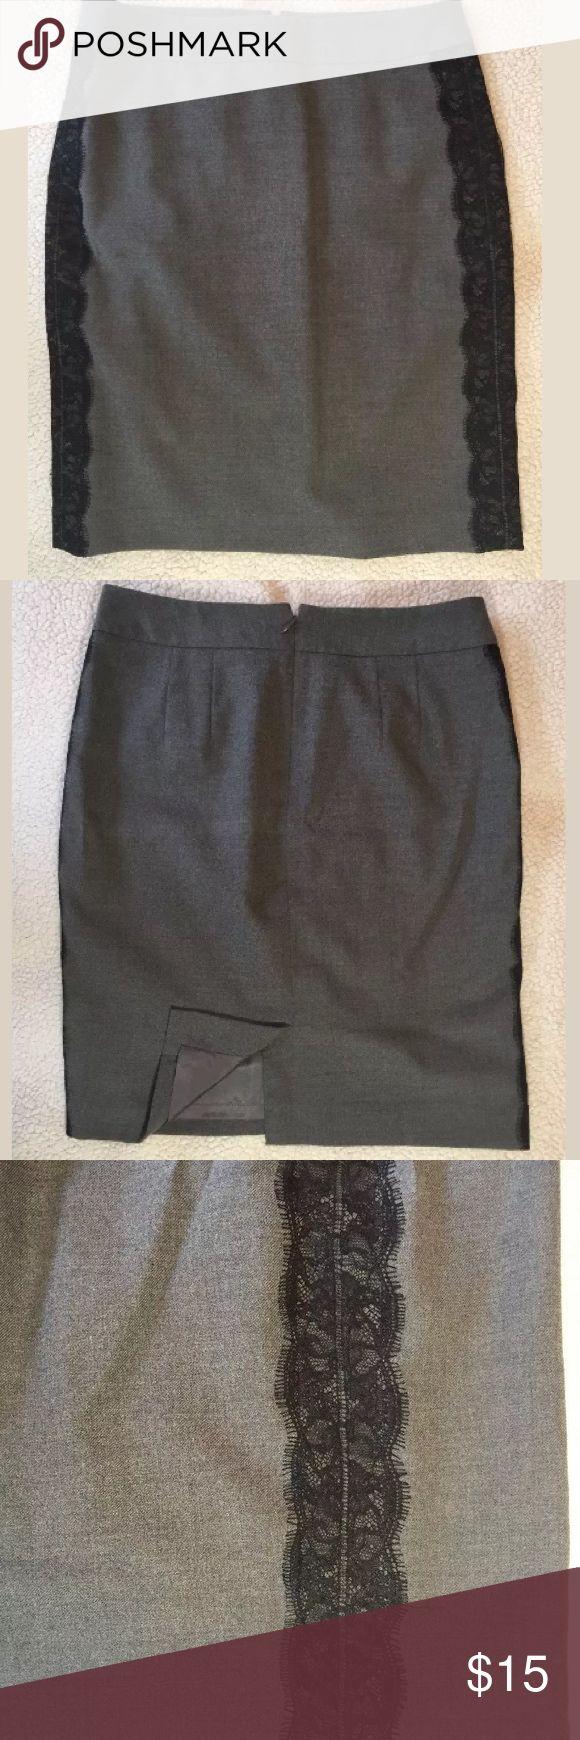 Loft Petite Pencil Skirt Size 2P Lightly worn. In good condition. LOFT Skirts Pencil